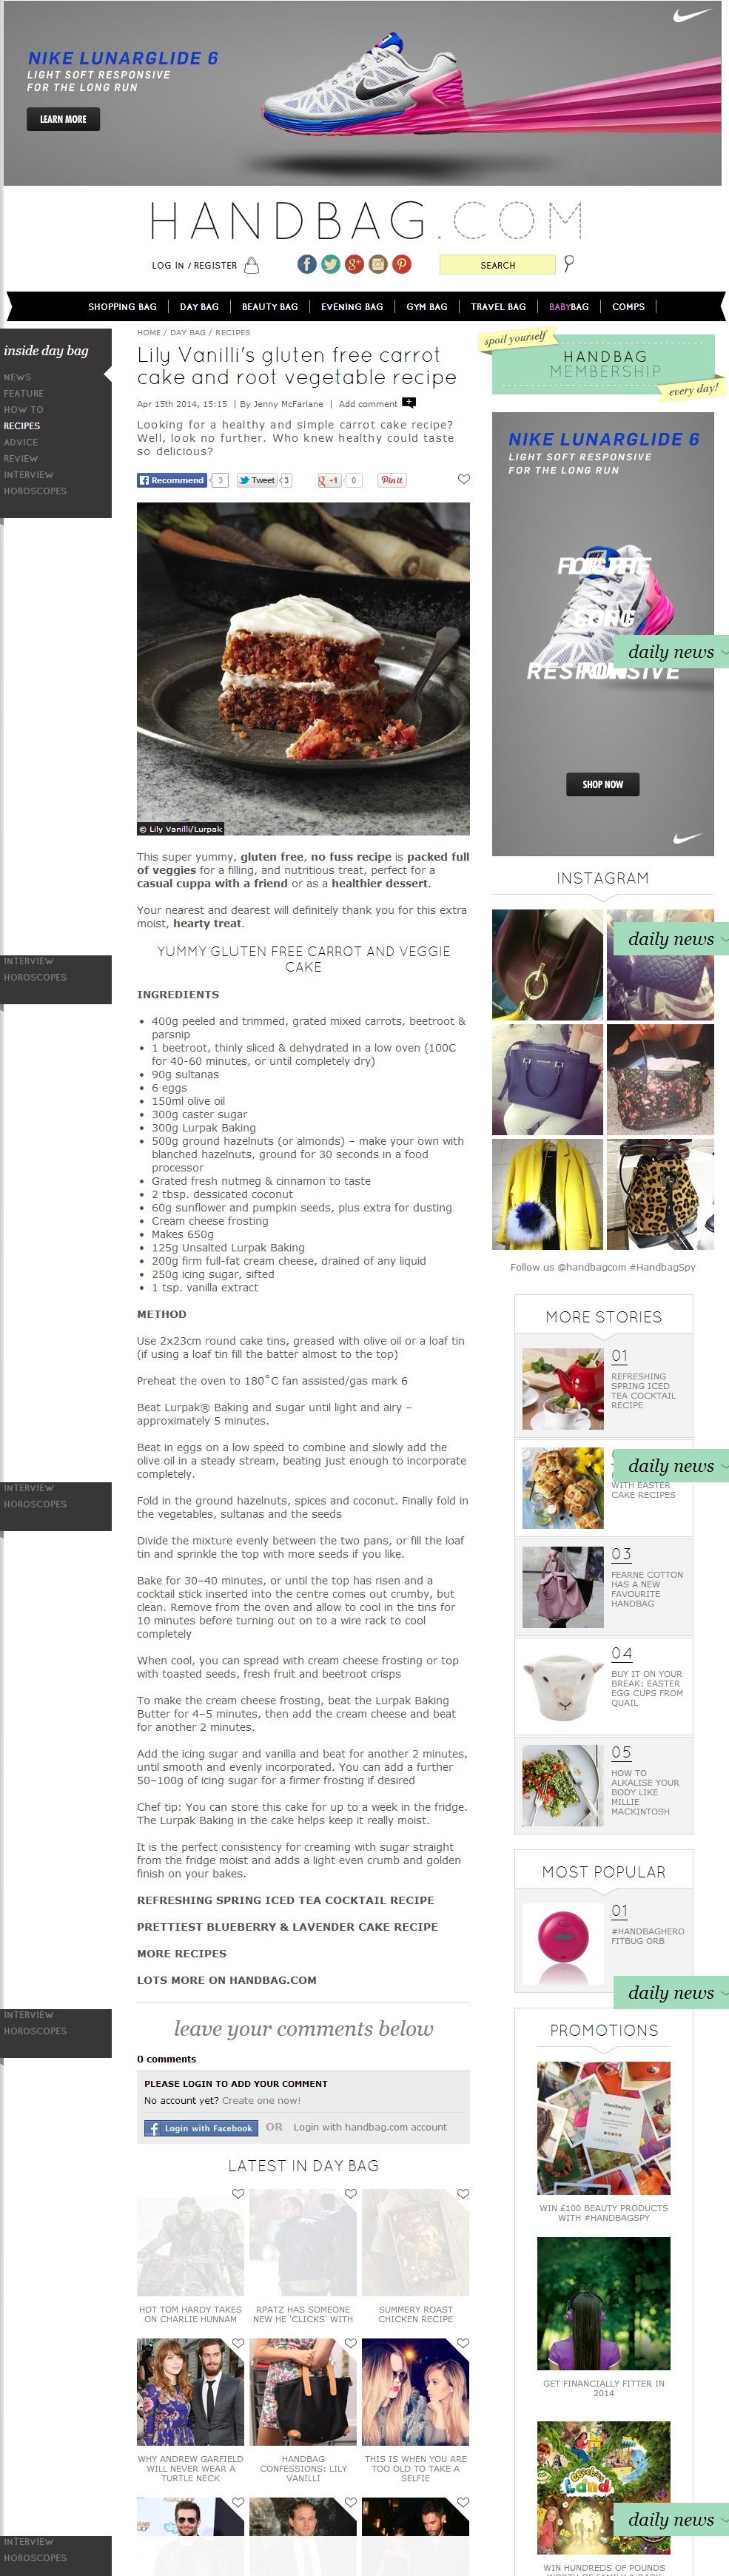 screencapture-www-handbag-com-day-bag-recipes-a564820-lily-vanillis-gluten-free-carrot-cake-and-root-vegetable-recipe-html